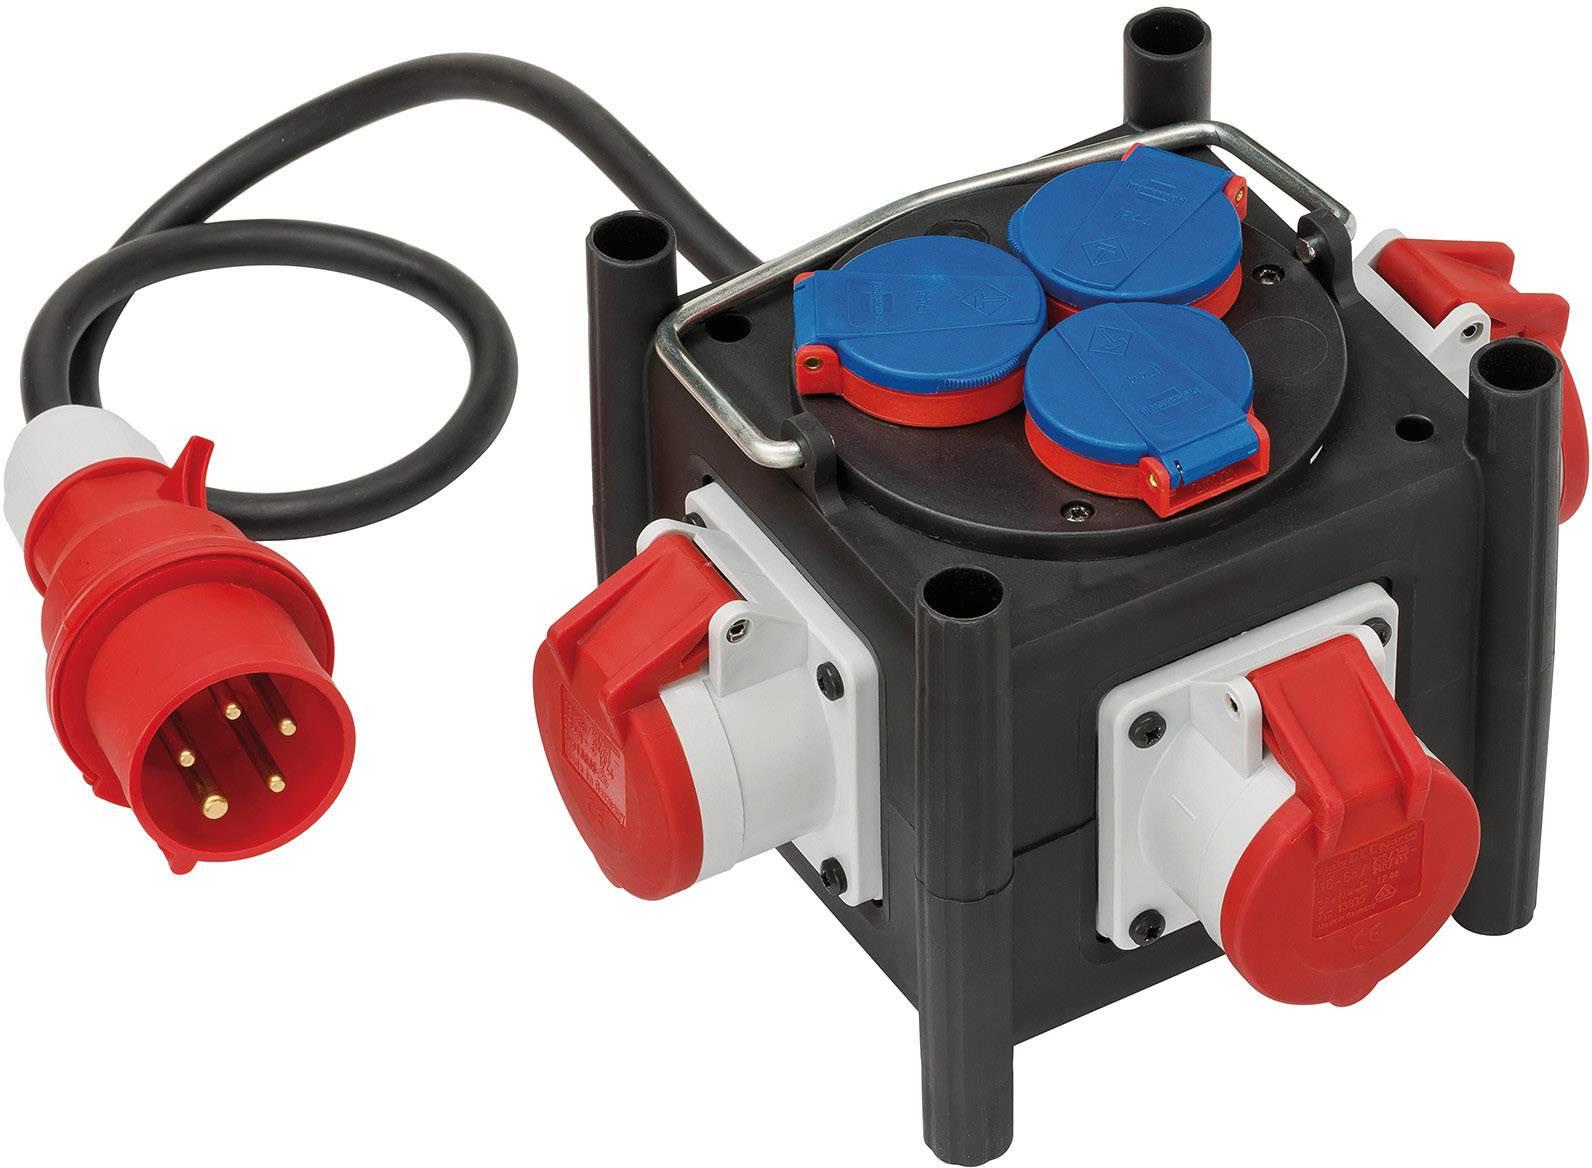 16A Stromverteiler Baustromverteiler Adapter CEE-Gerätestecker Verteiler Leitung